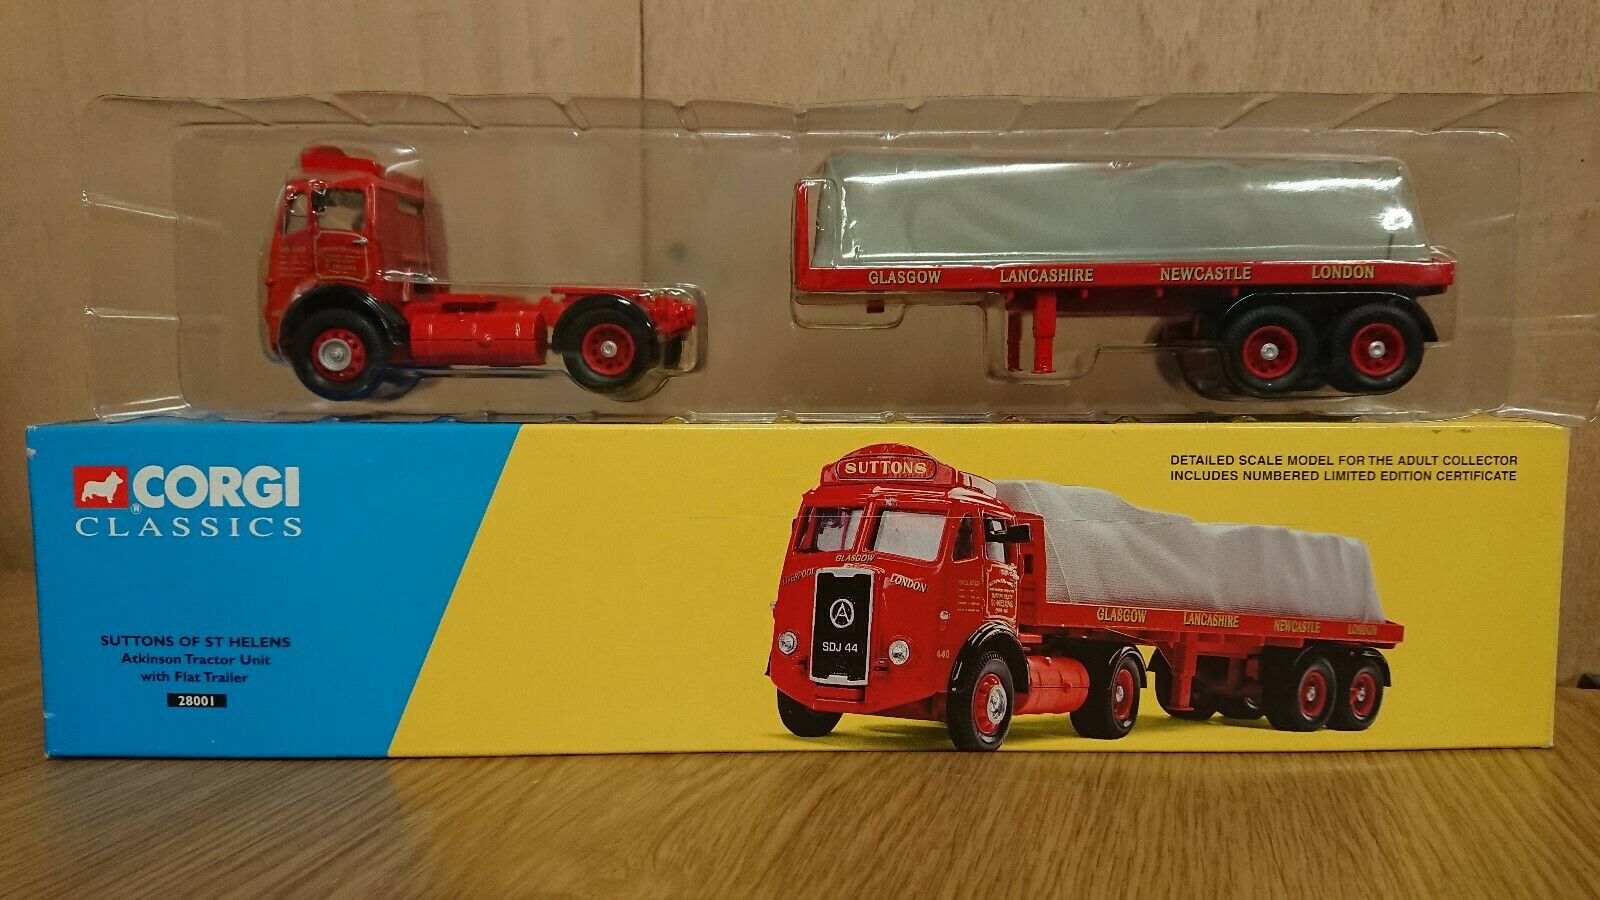 Corgi 28001 Atkinson Tractor Unit & Flat Trailer SUTTONS Ltd Edition No.2